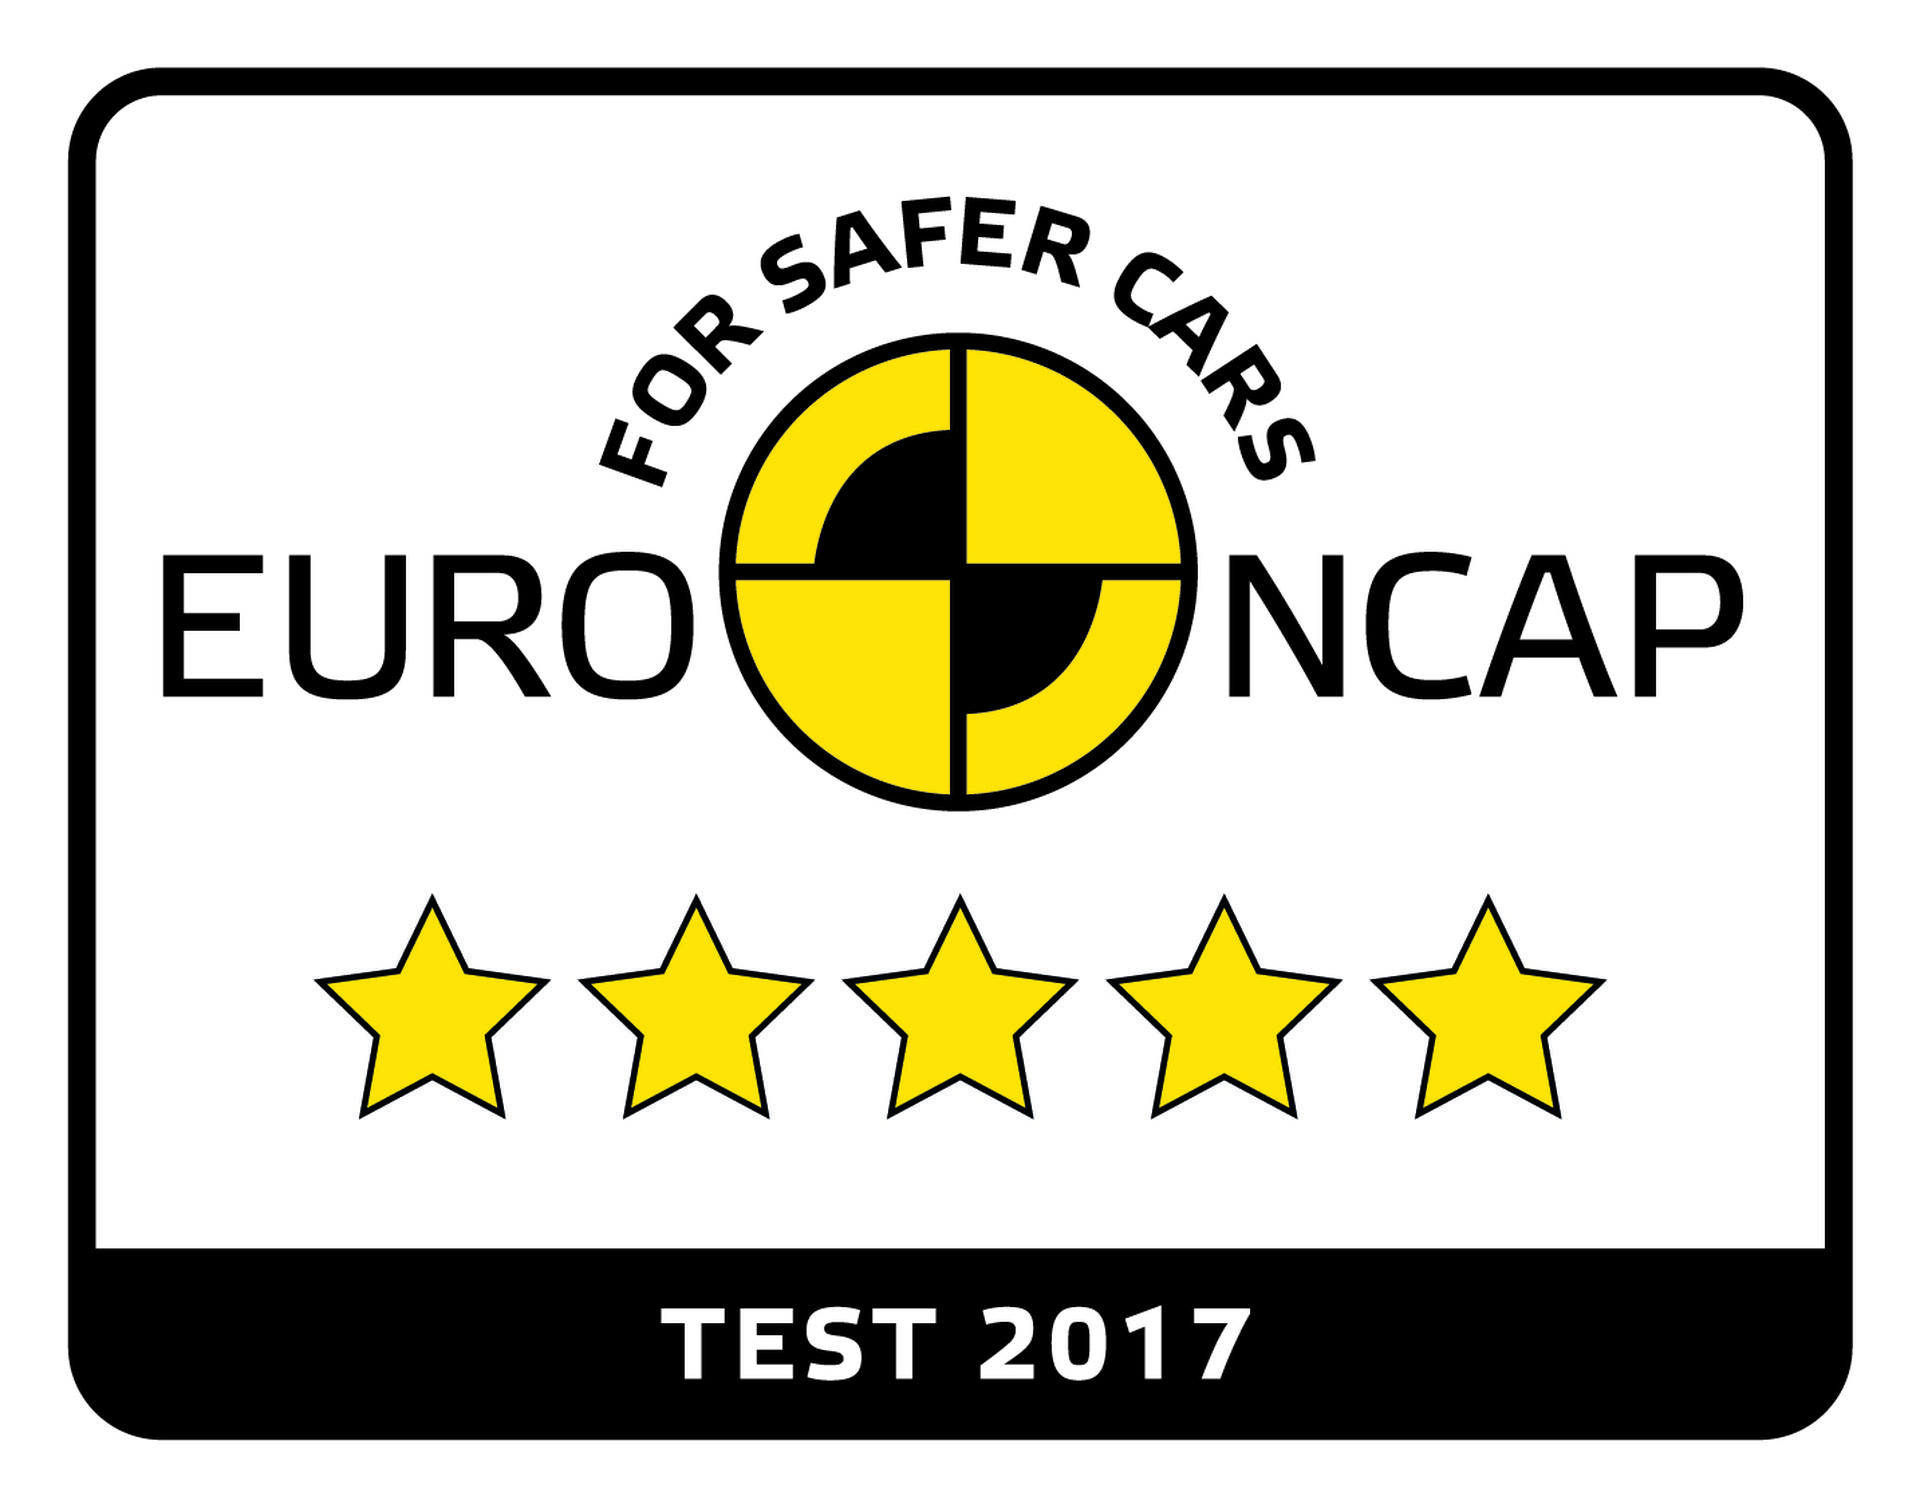 2017 toyota yaris achieves 5 star euro ncap safety rating 2017 toyota yaris achieves 5 star euro